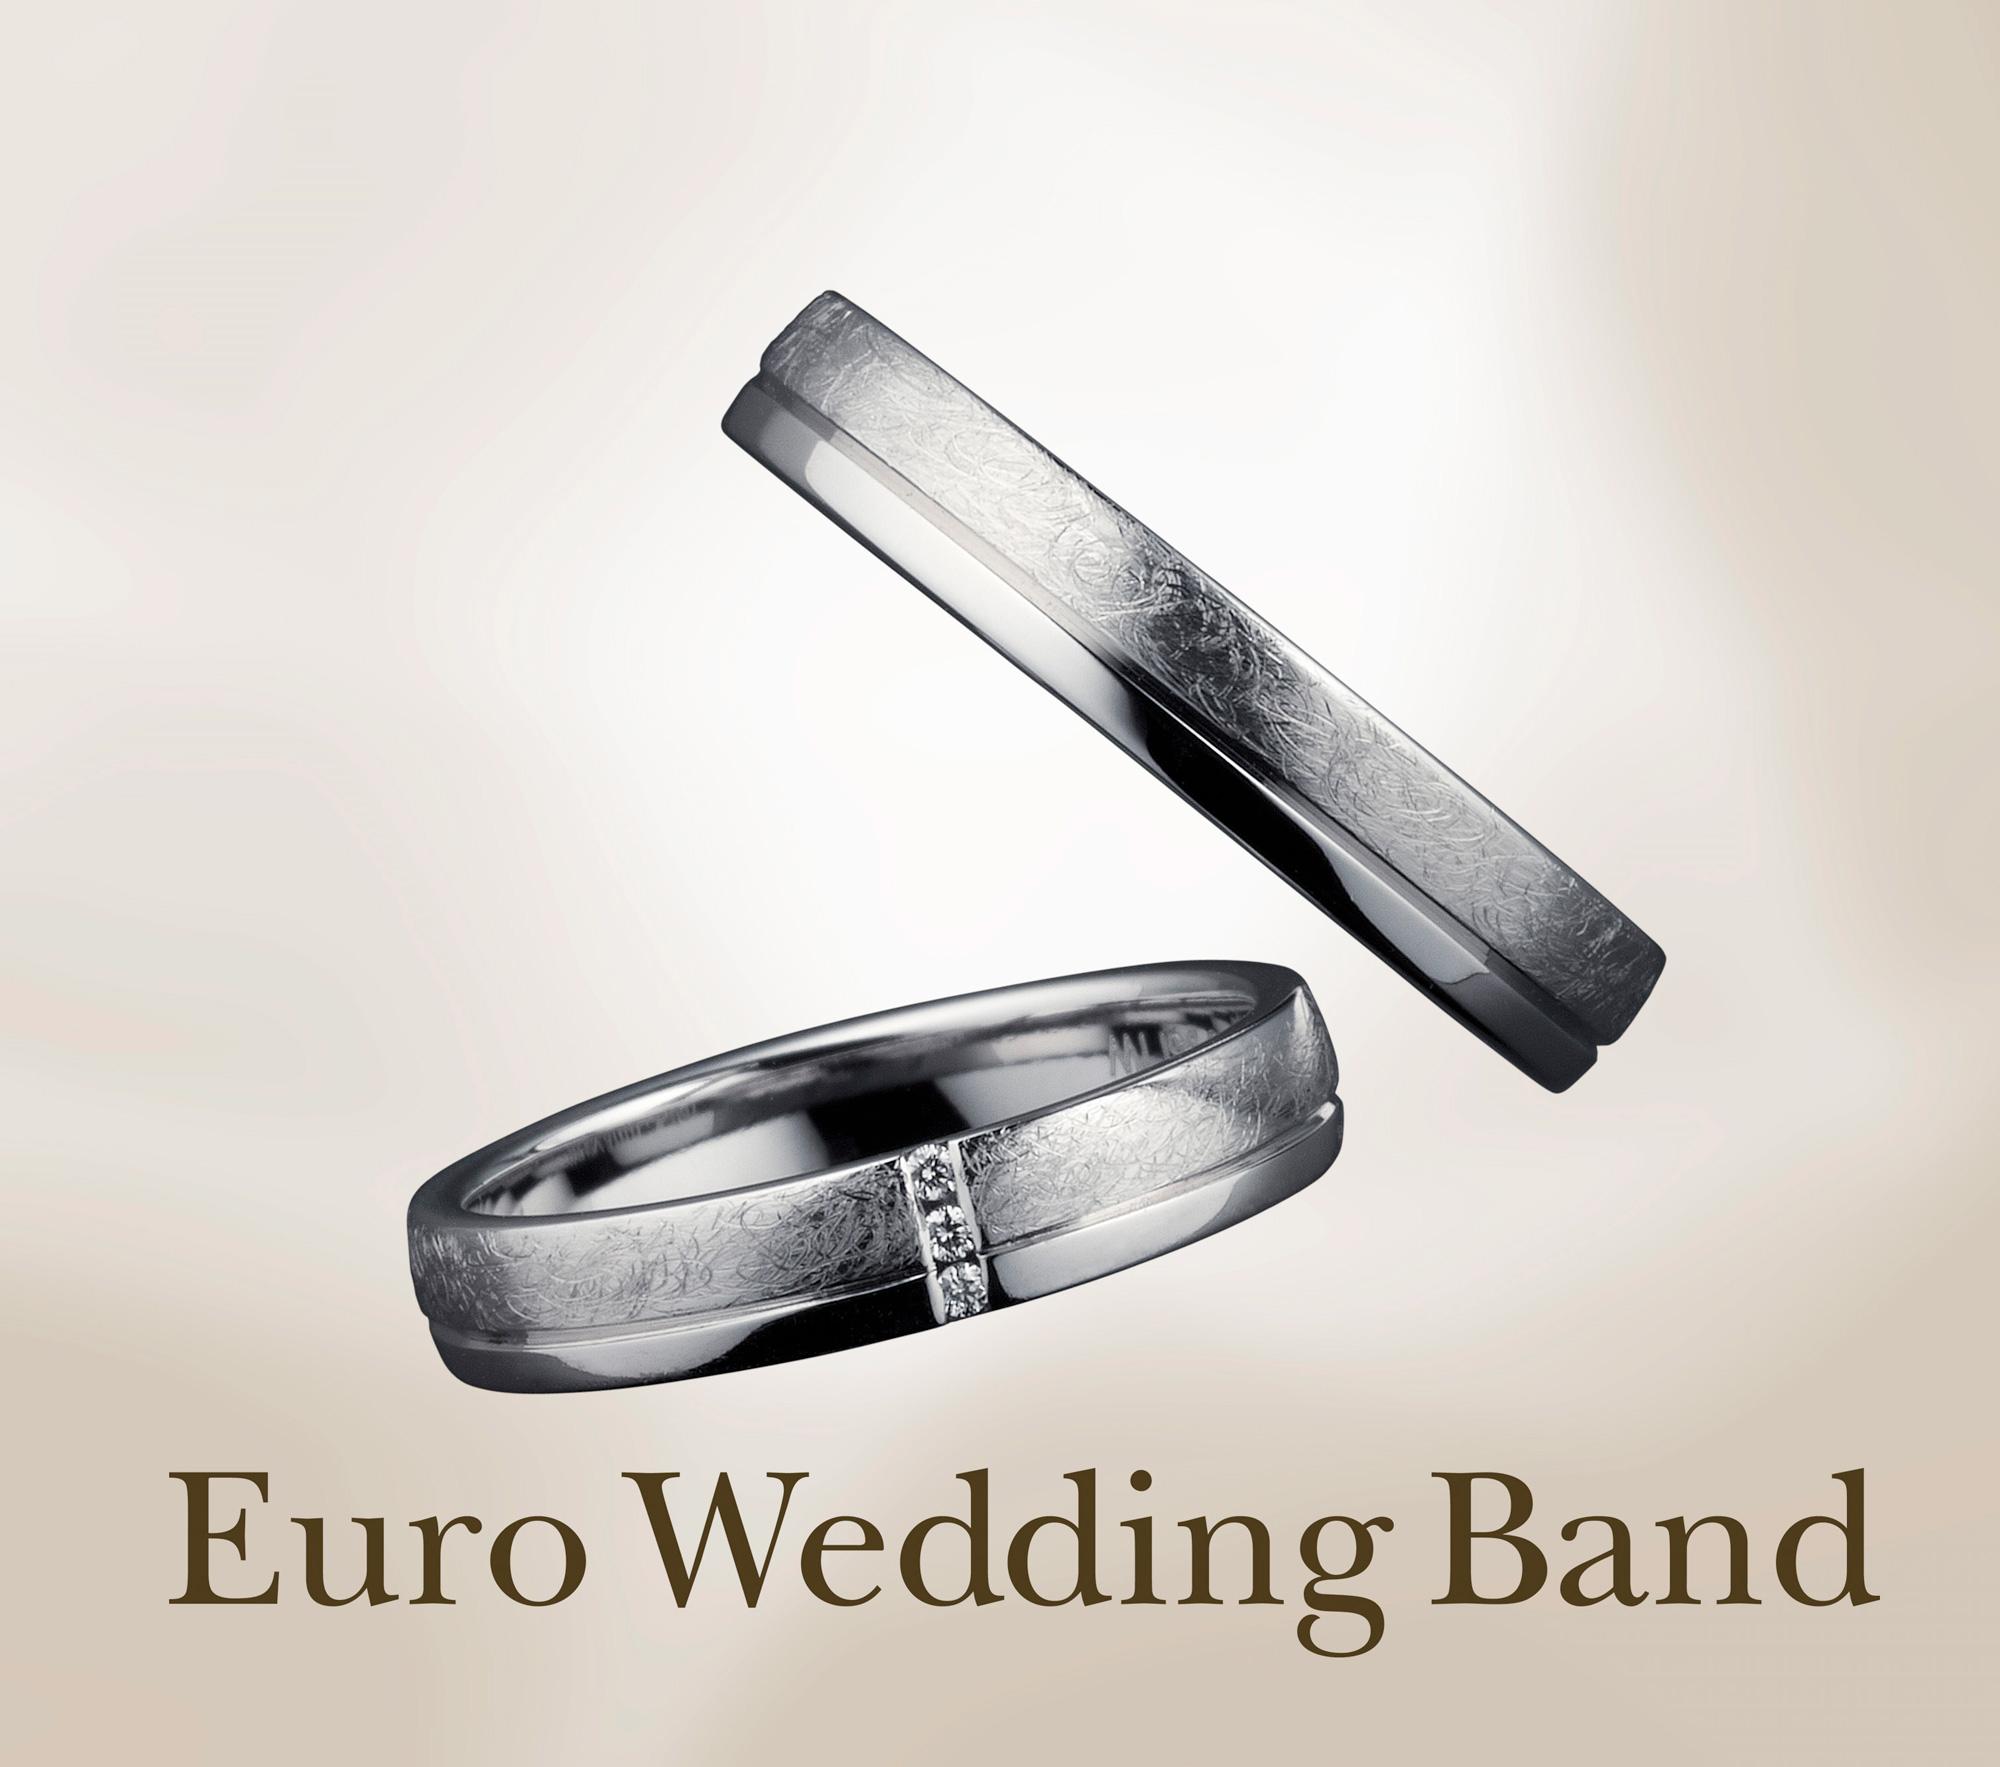 【GRACISBRIDAL札幌北2条店】Euro Wedding Bandプラチナキャンペーンもうすぐ終了